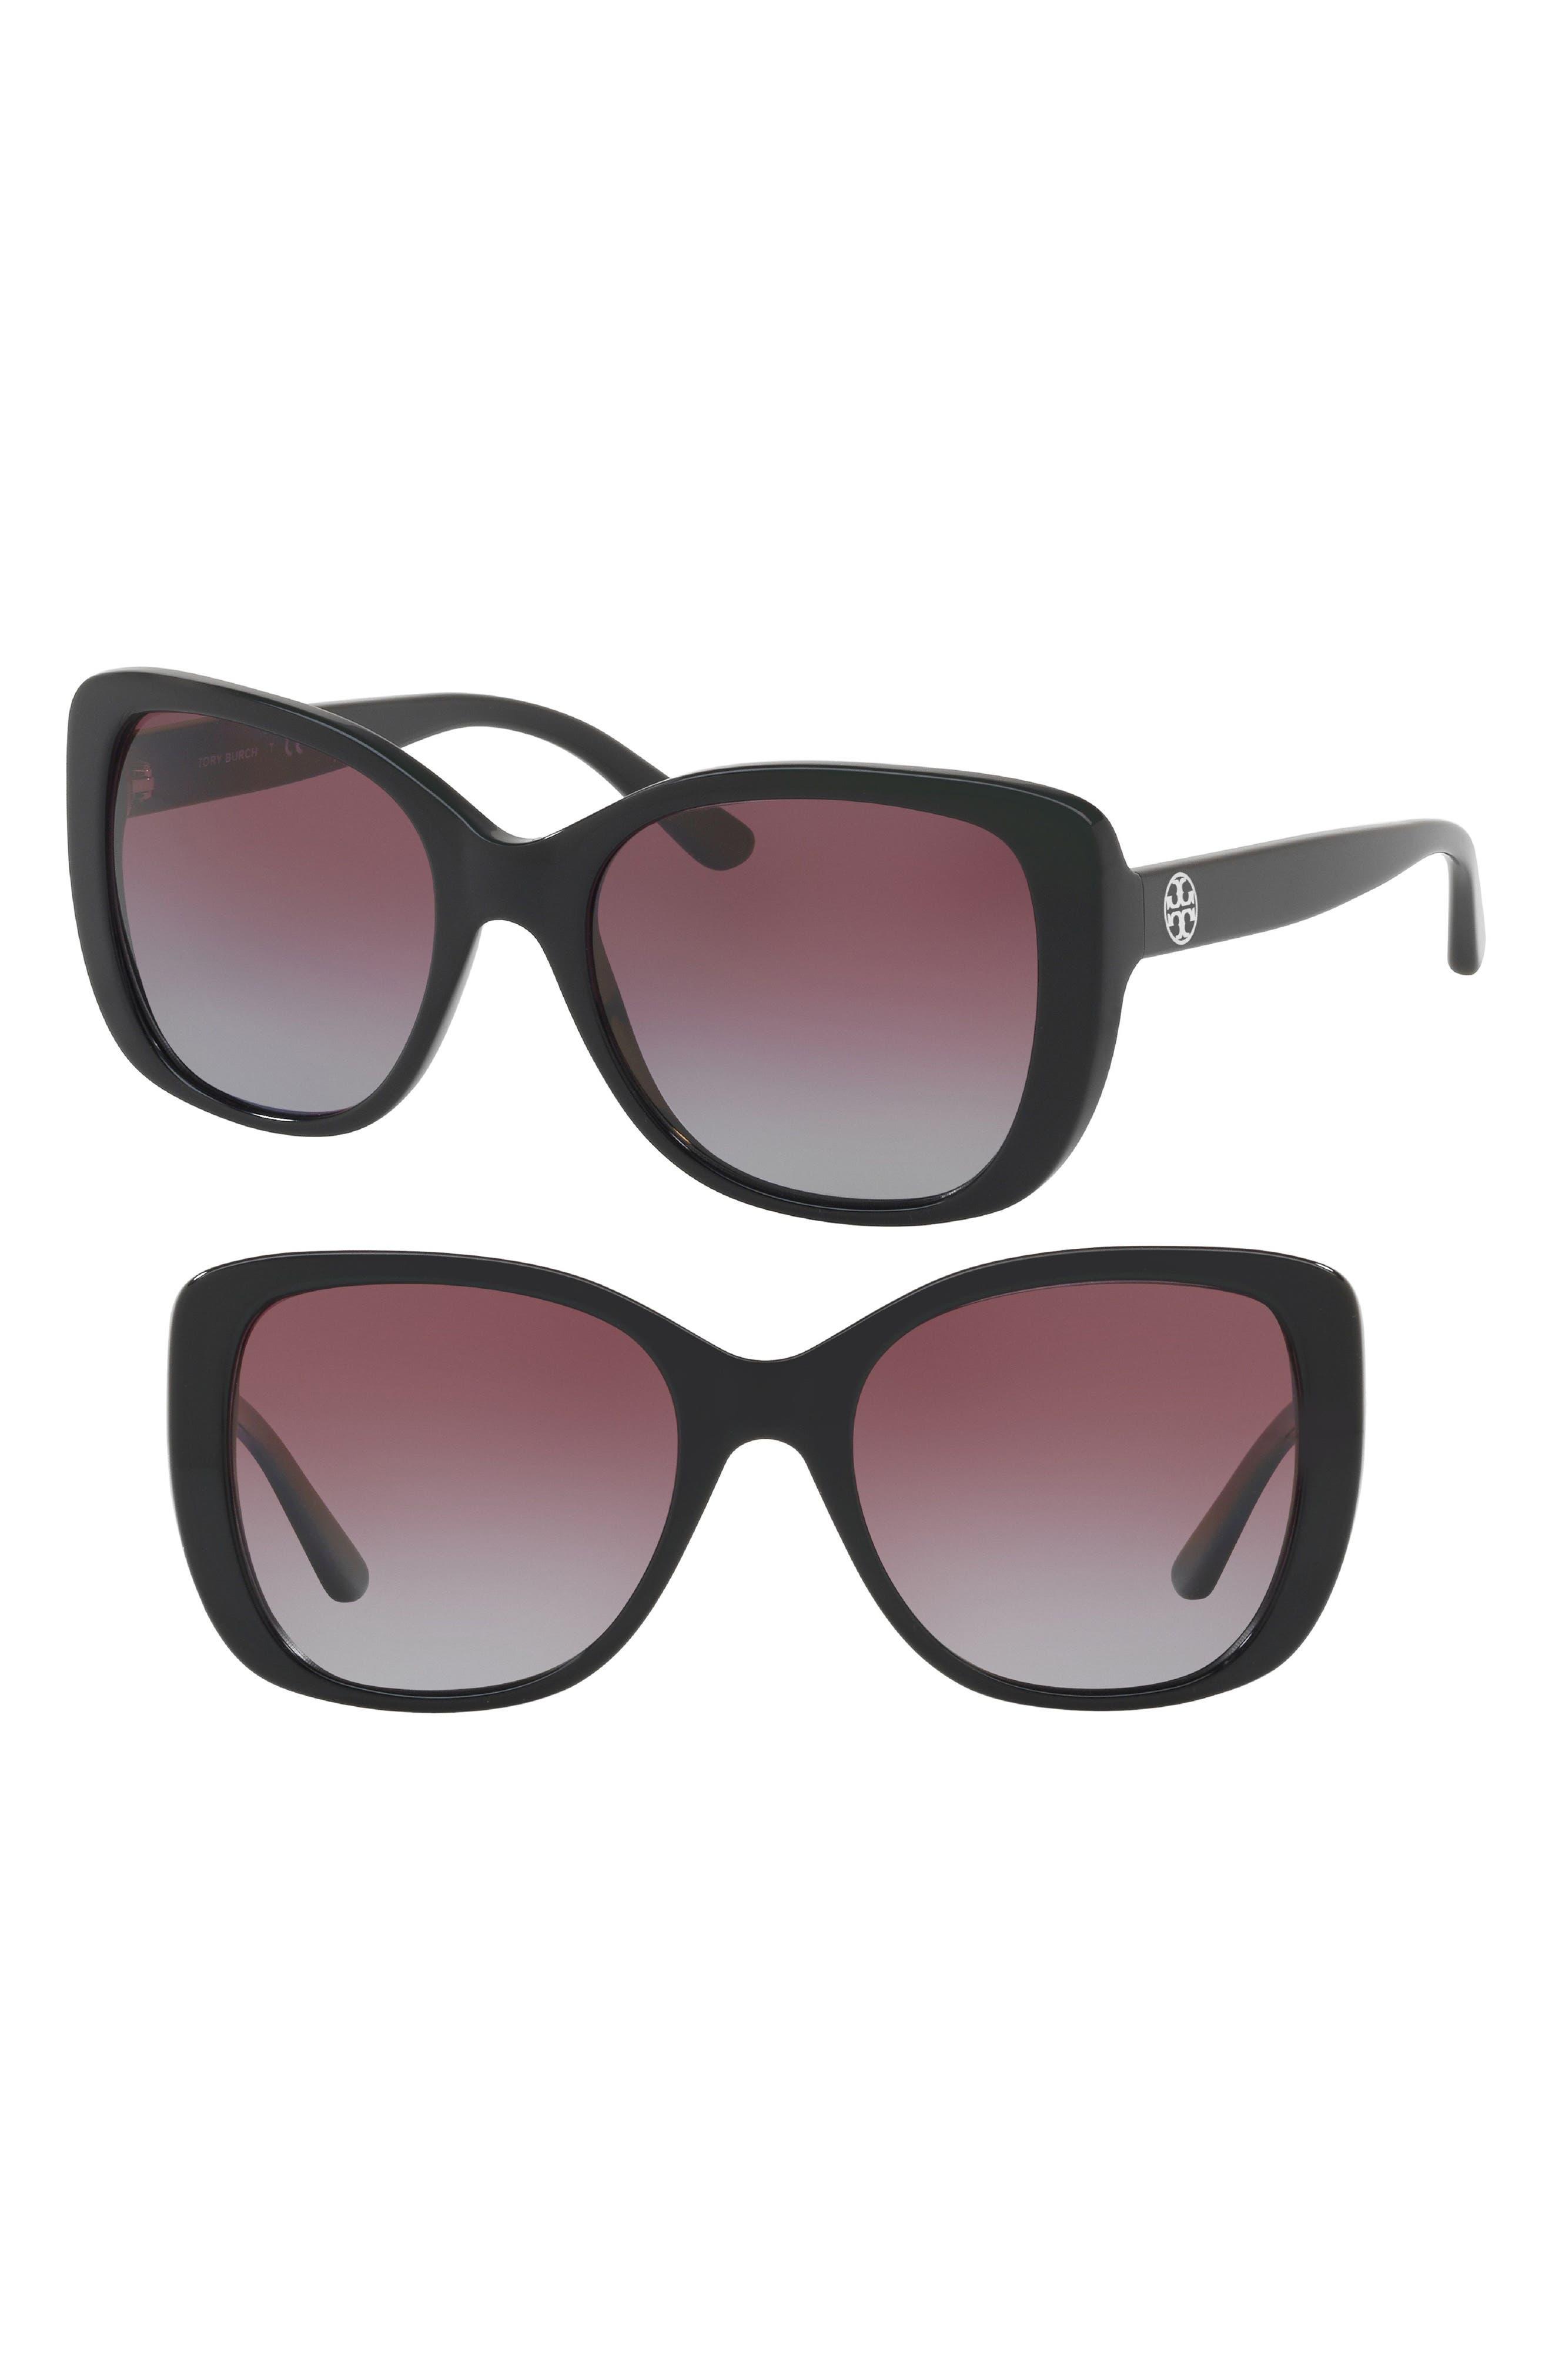 Tory Burch 53mm Gradient Rectangle Sunglasses